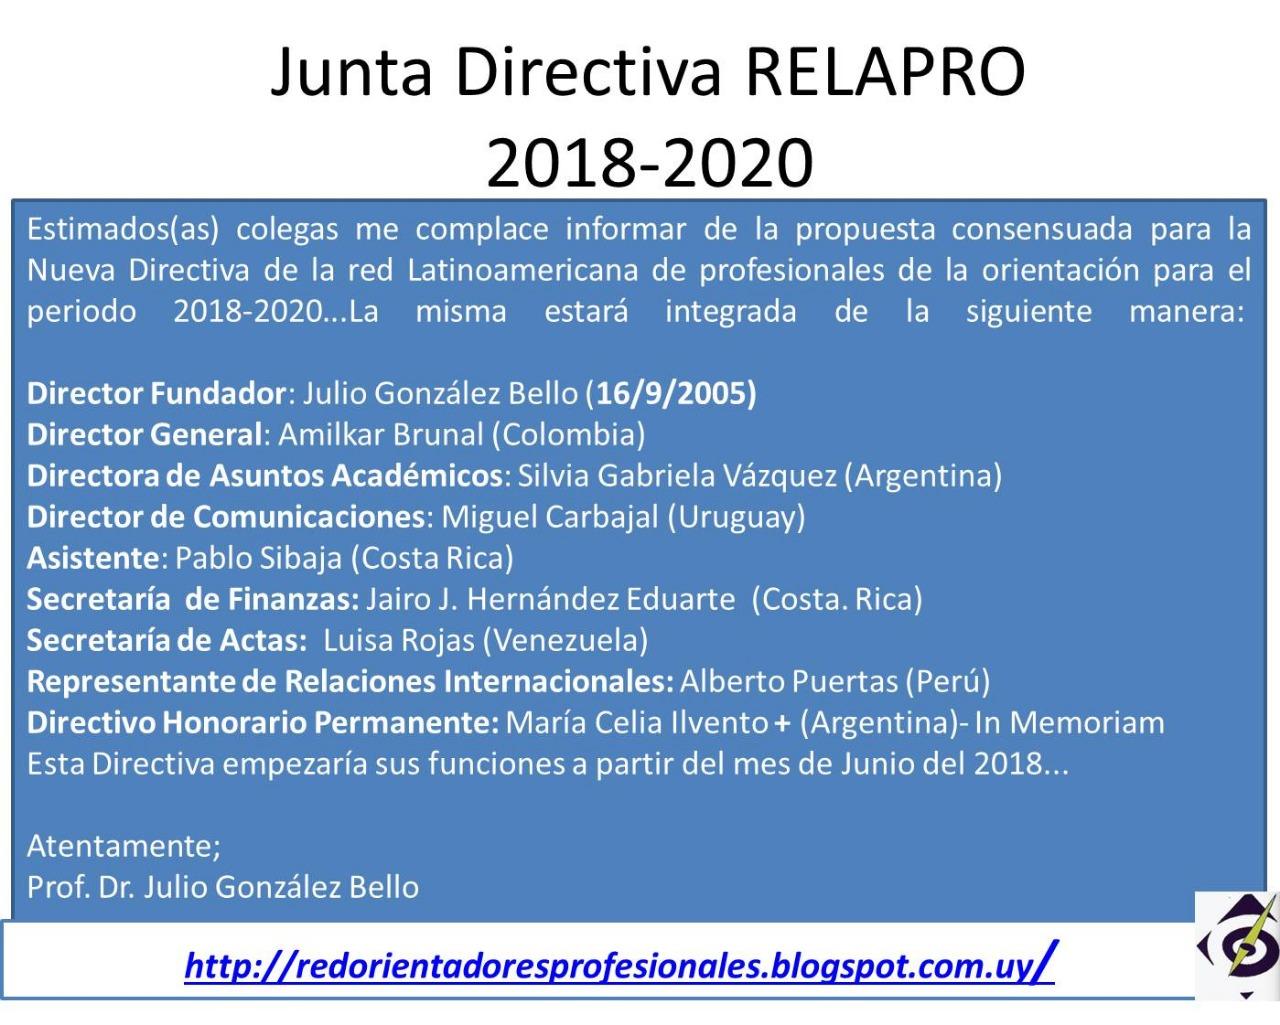 Junta Directiva RELAPRO